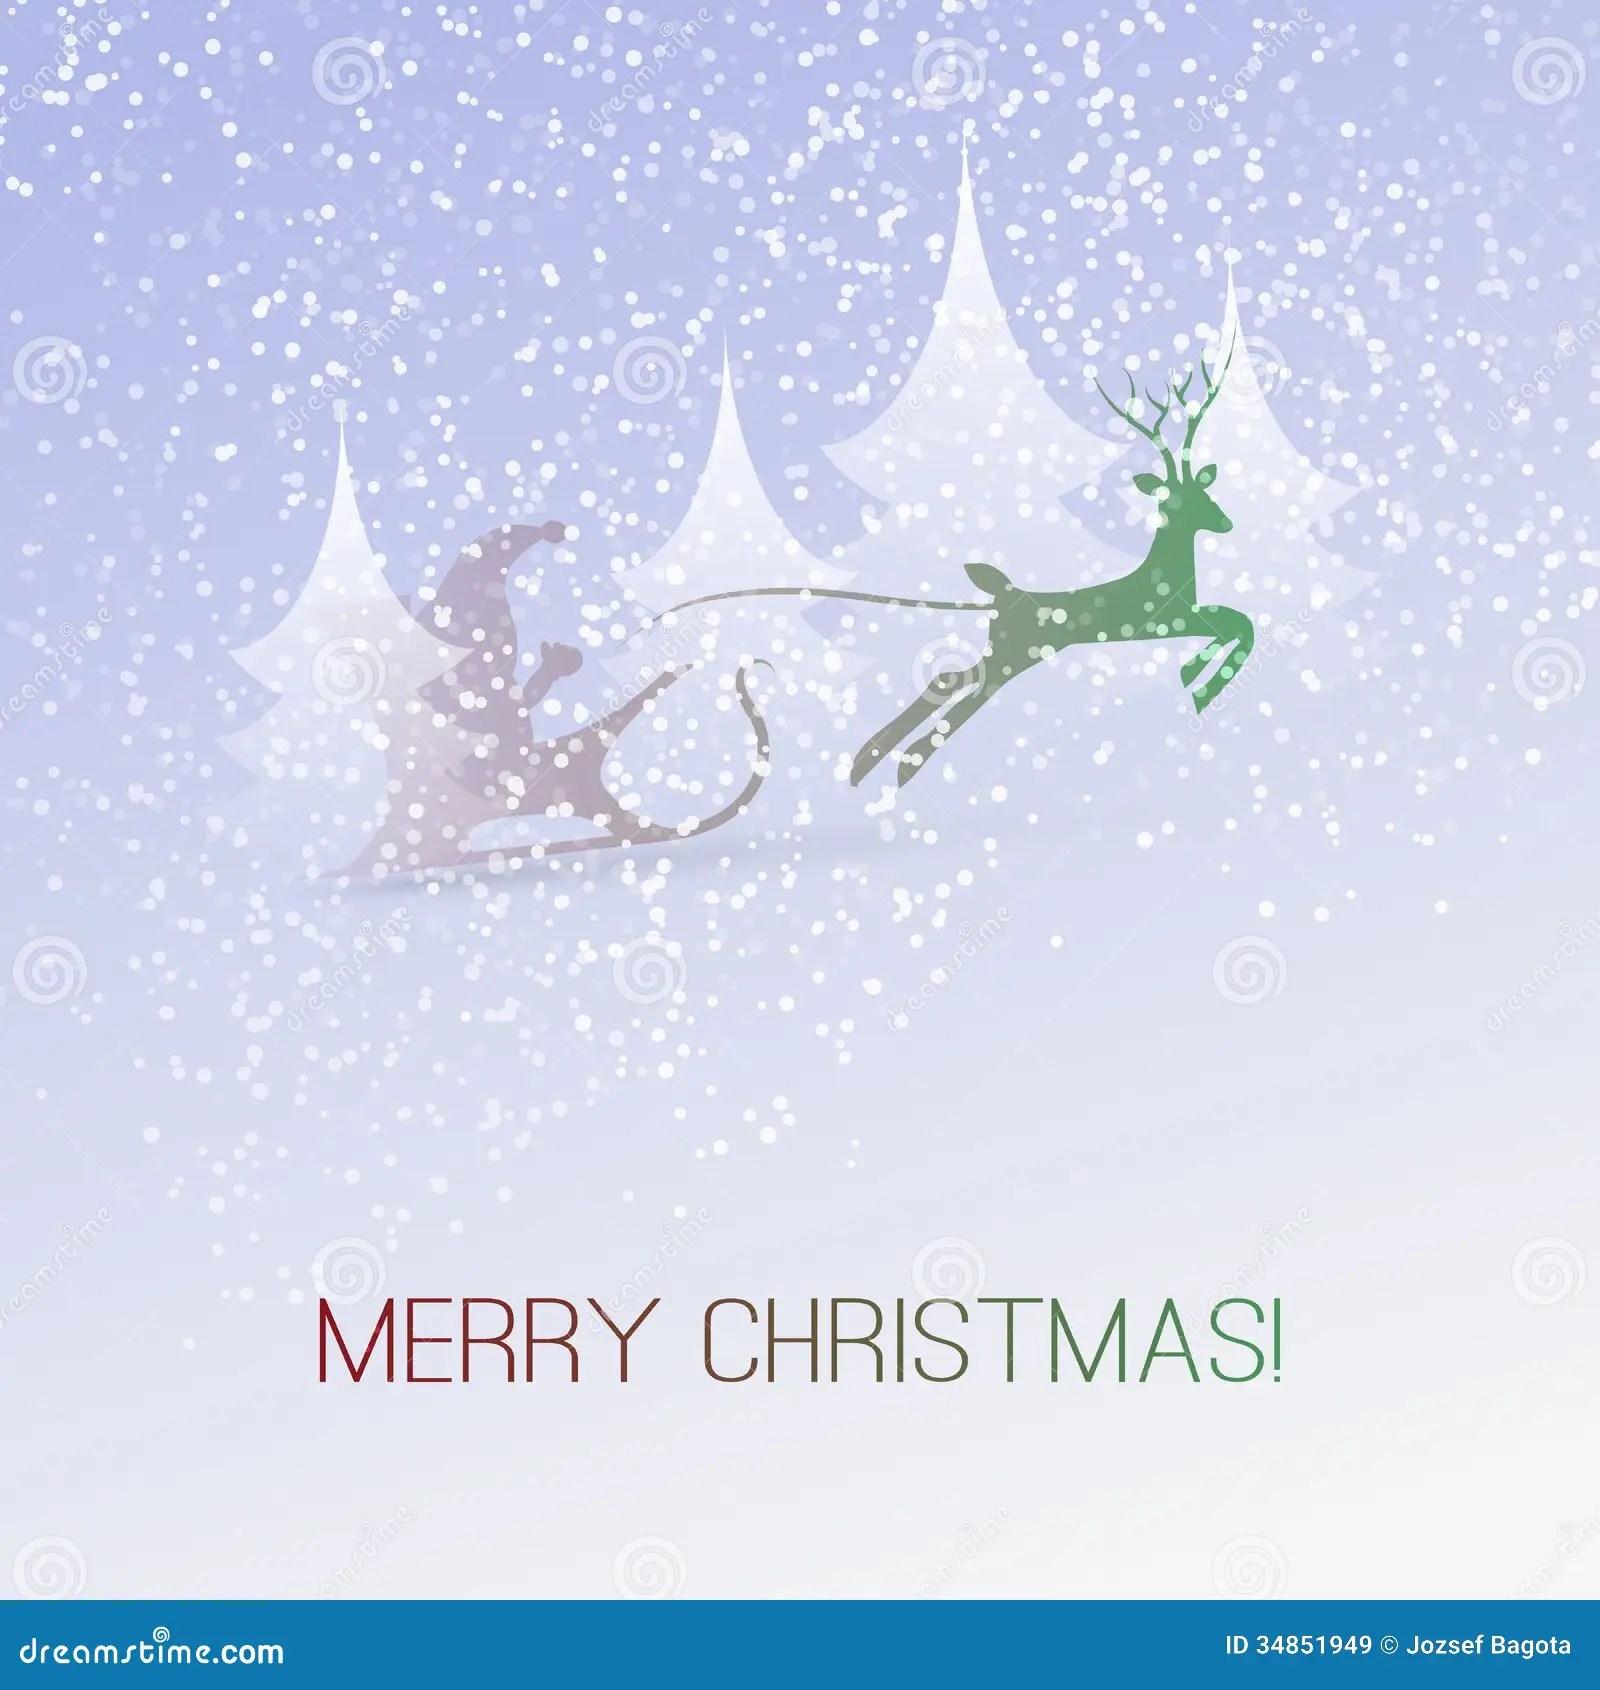 Fall Deer Wallpaper Christmas Card Stock Vector Image Of Celebrate Deer